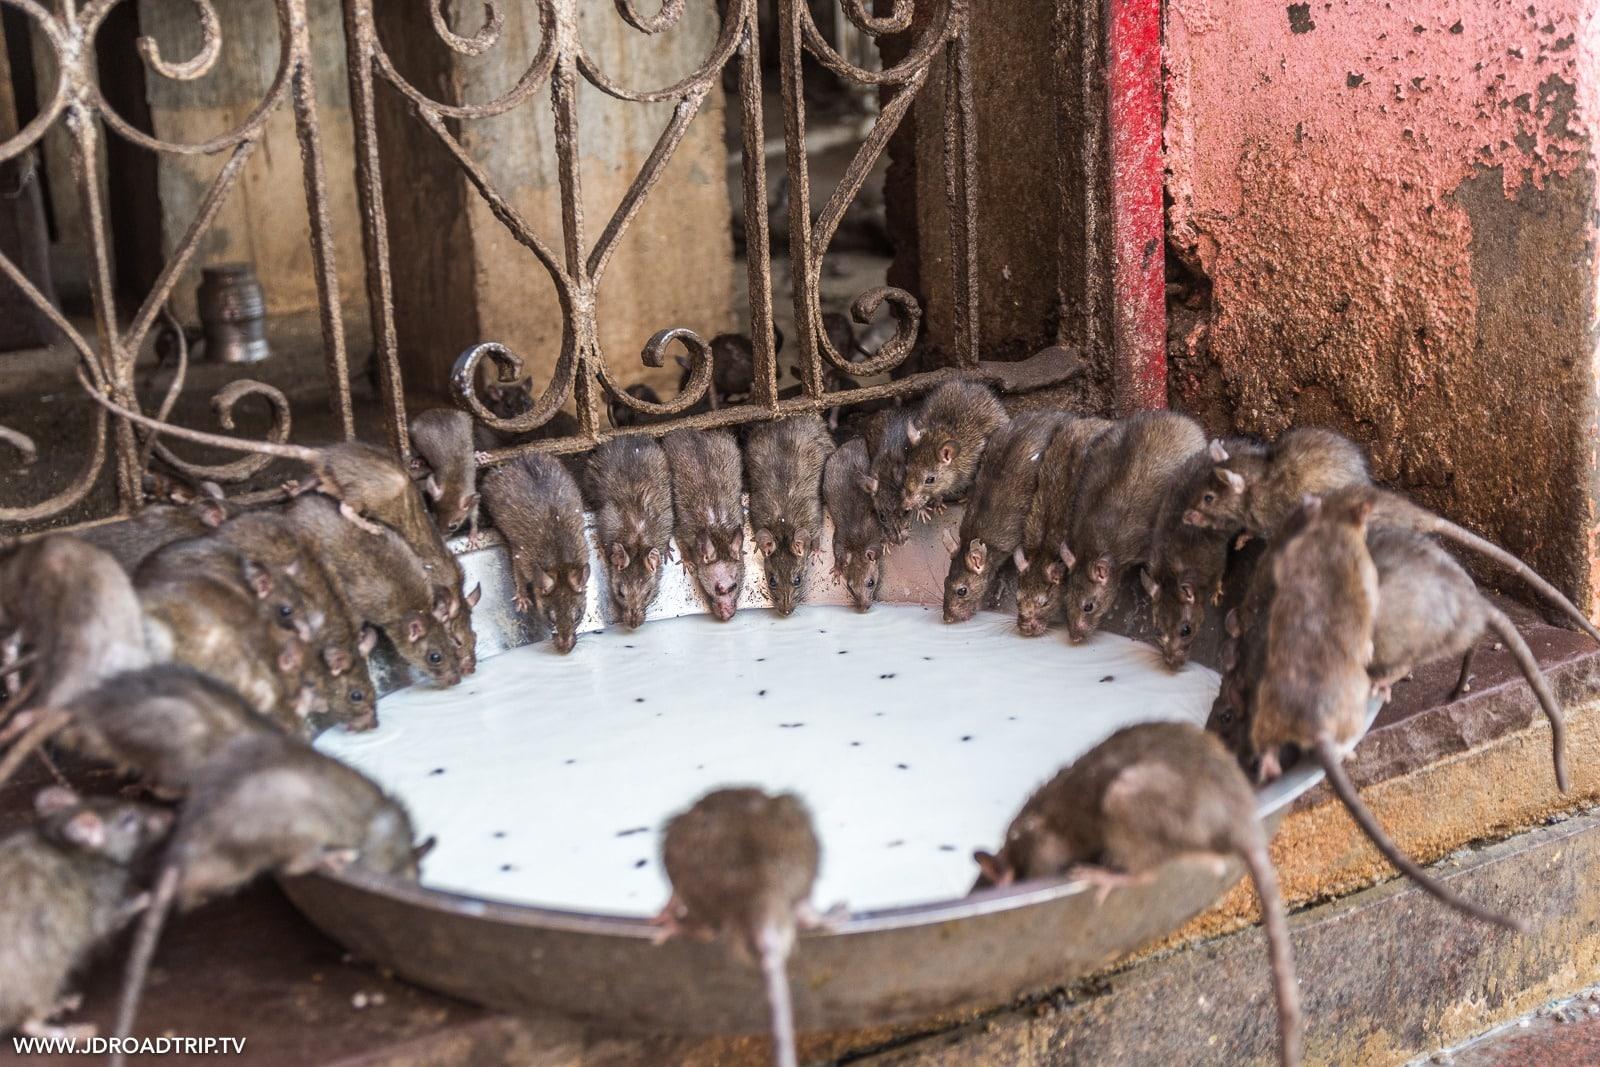 Visiter Bikaner en 2 jours - Temple Karni Mata, Temple des rats